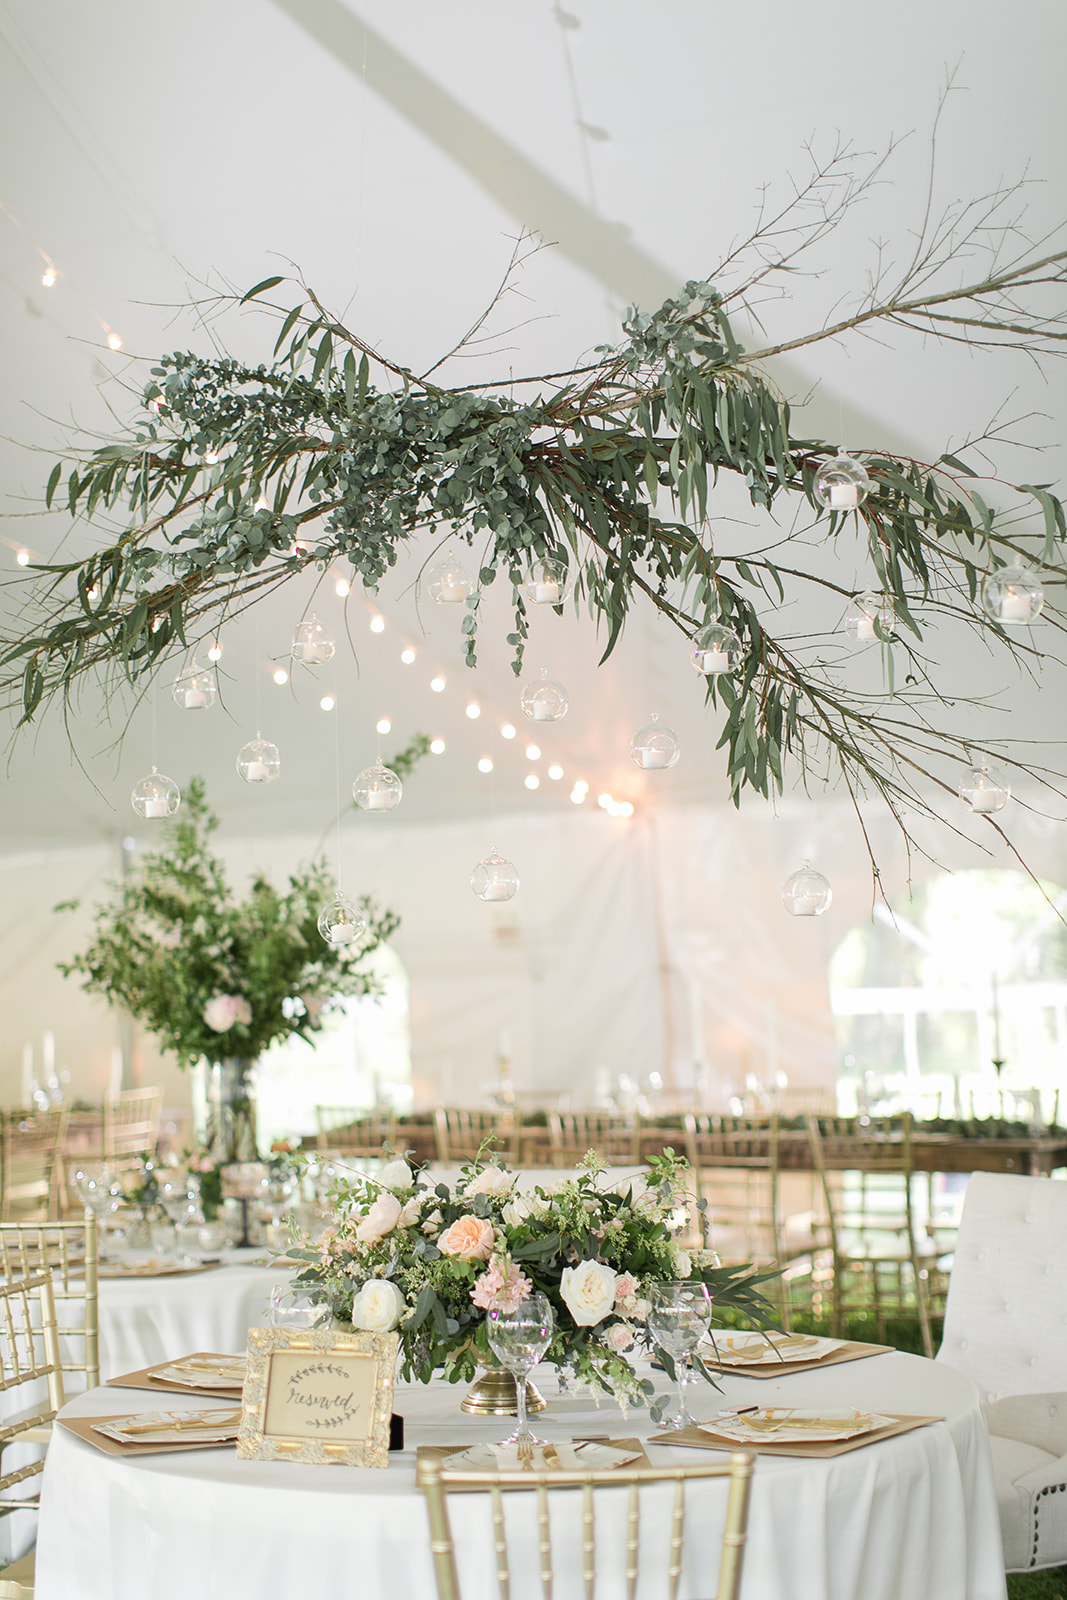 Abbey-Colby-wedding-512_websize.jpg